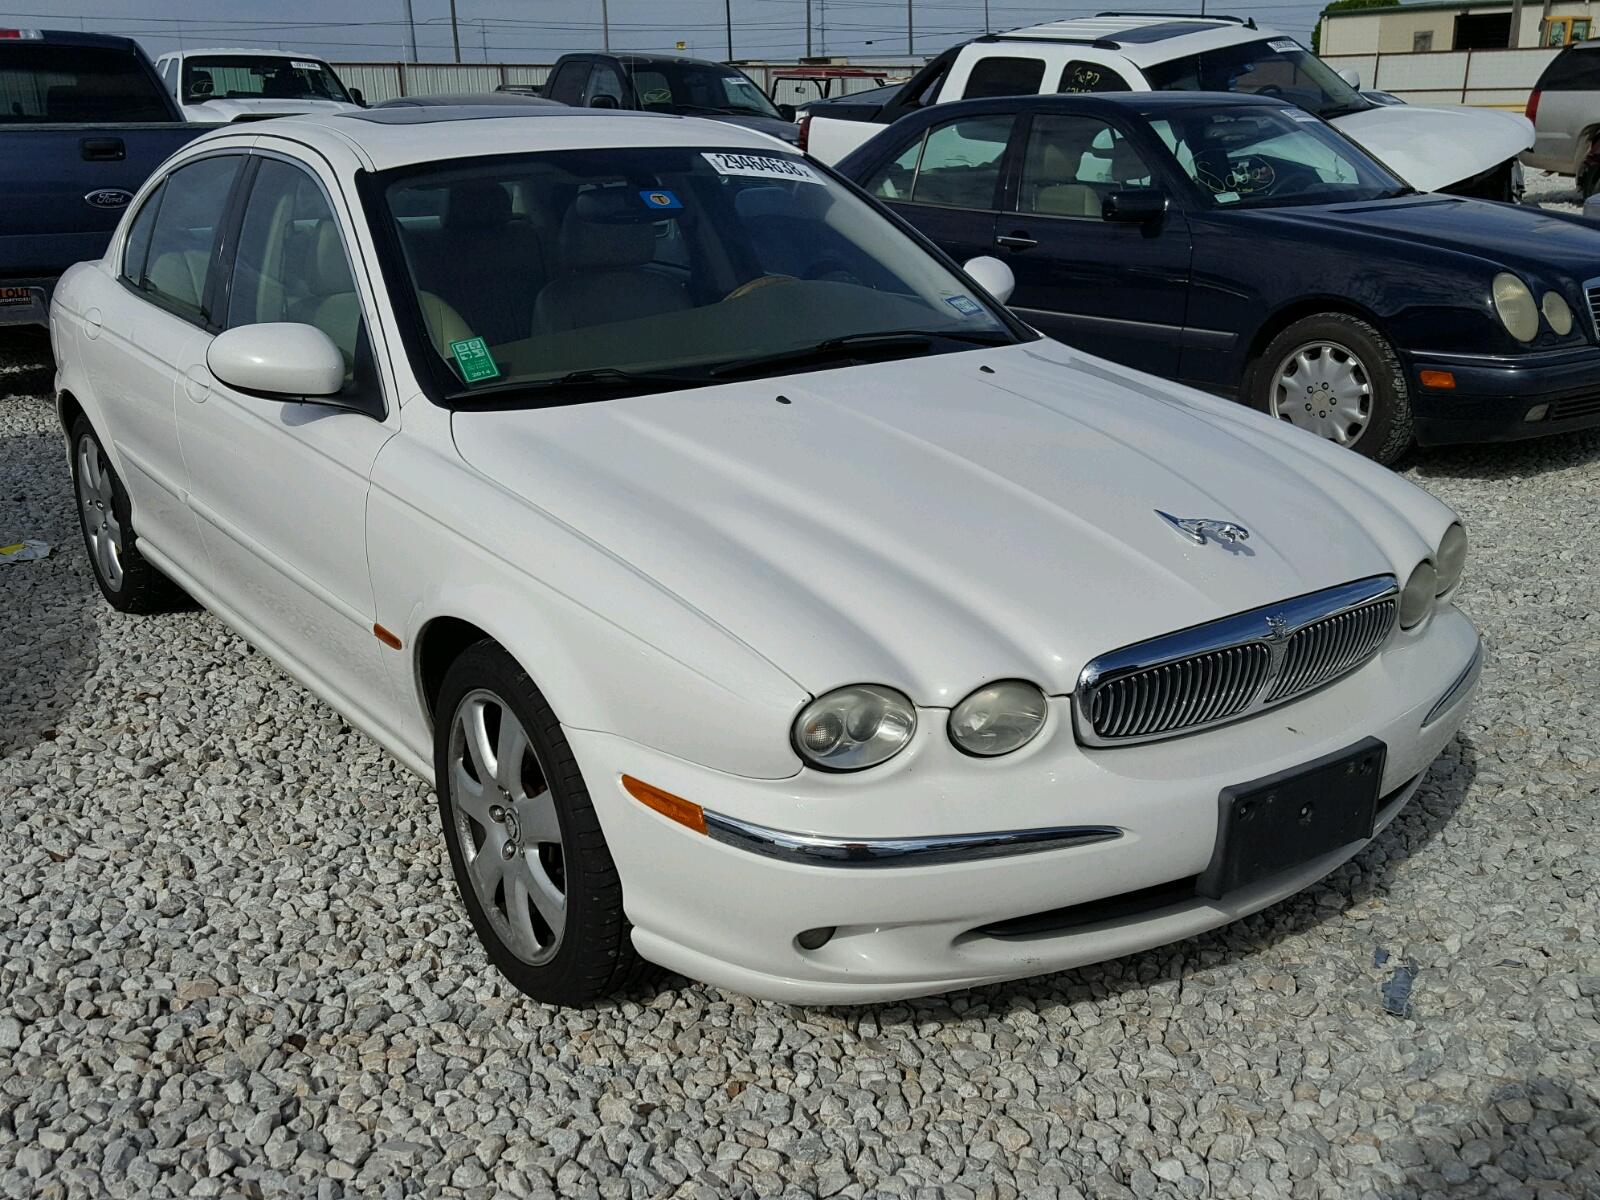 jaguar auto carfinder view tx type silver austin en auctions in left online salvage sale x for vehicle on title copart lot